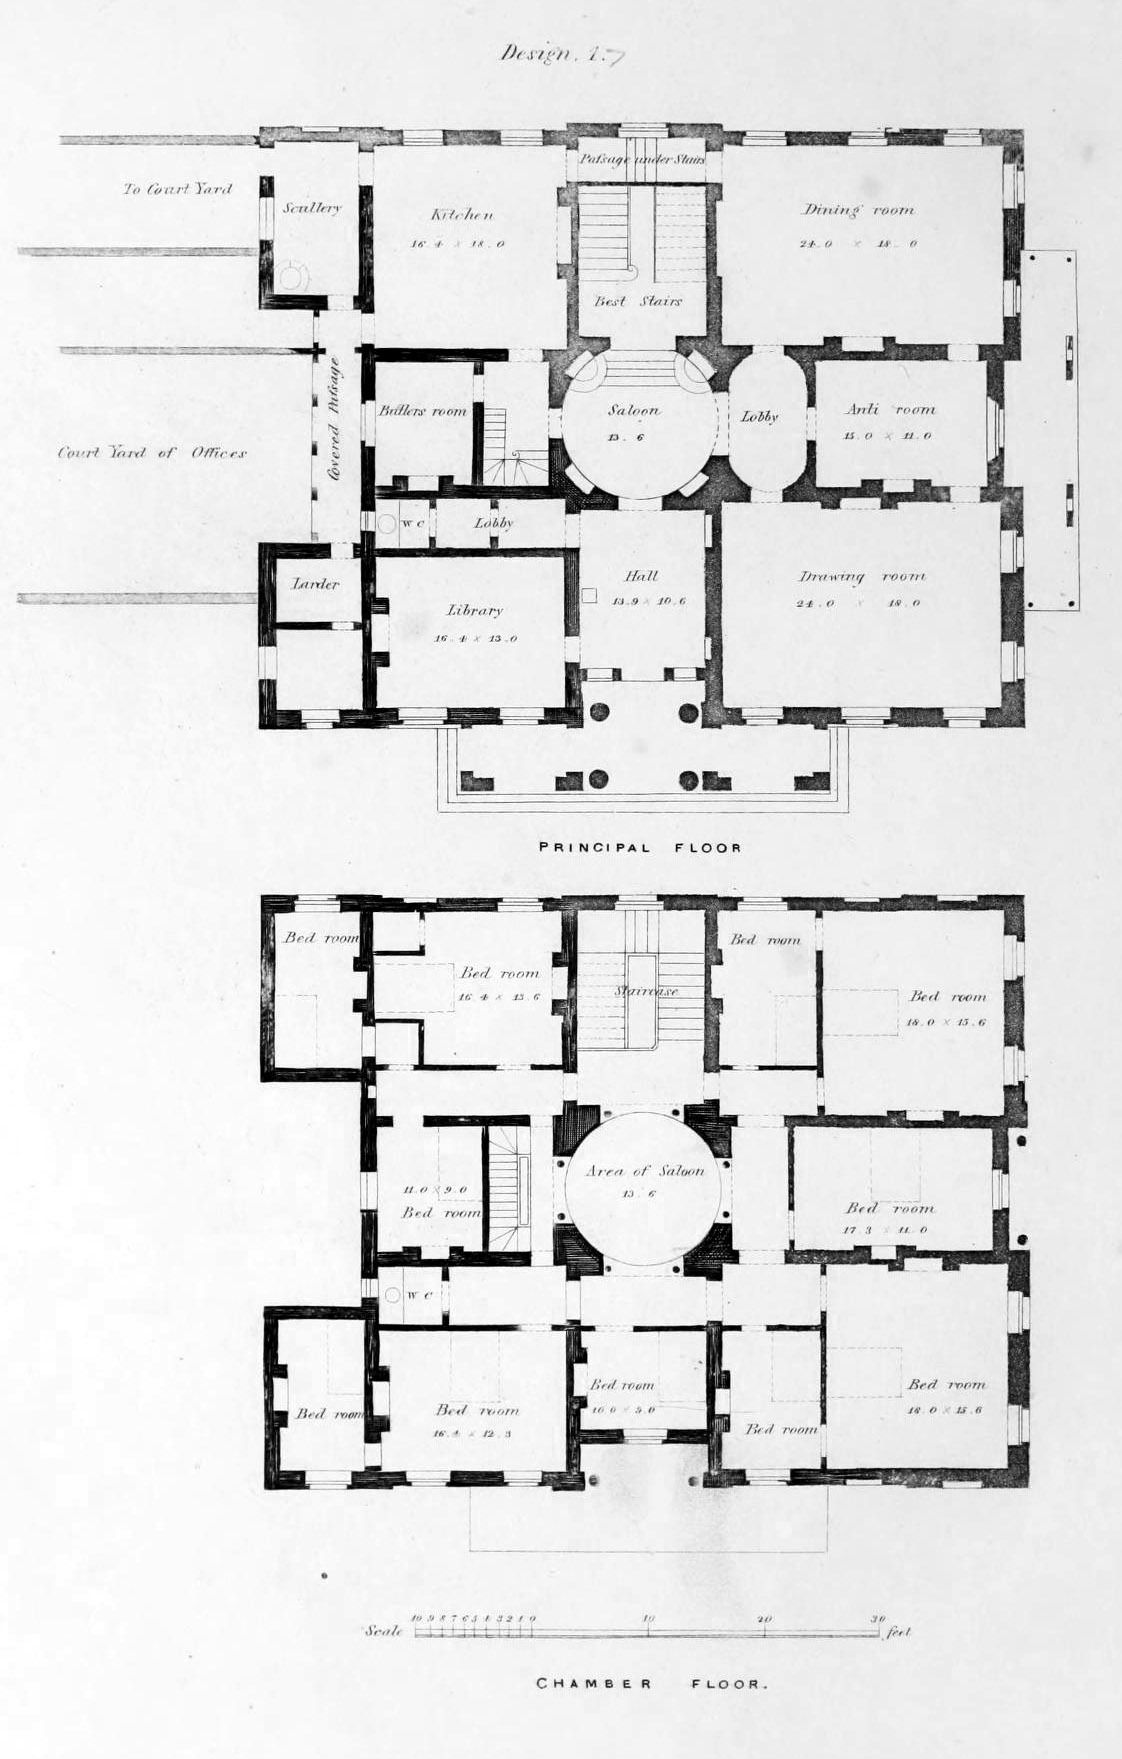 Archi Maps Floor Plans For An Urban Residence England Floor Plans Architectural Floor Plans Mansion Floor Plan